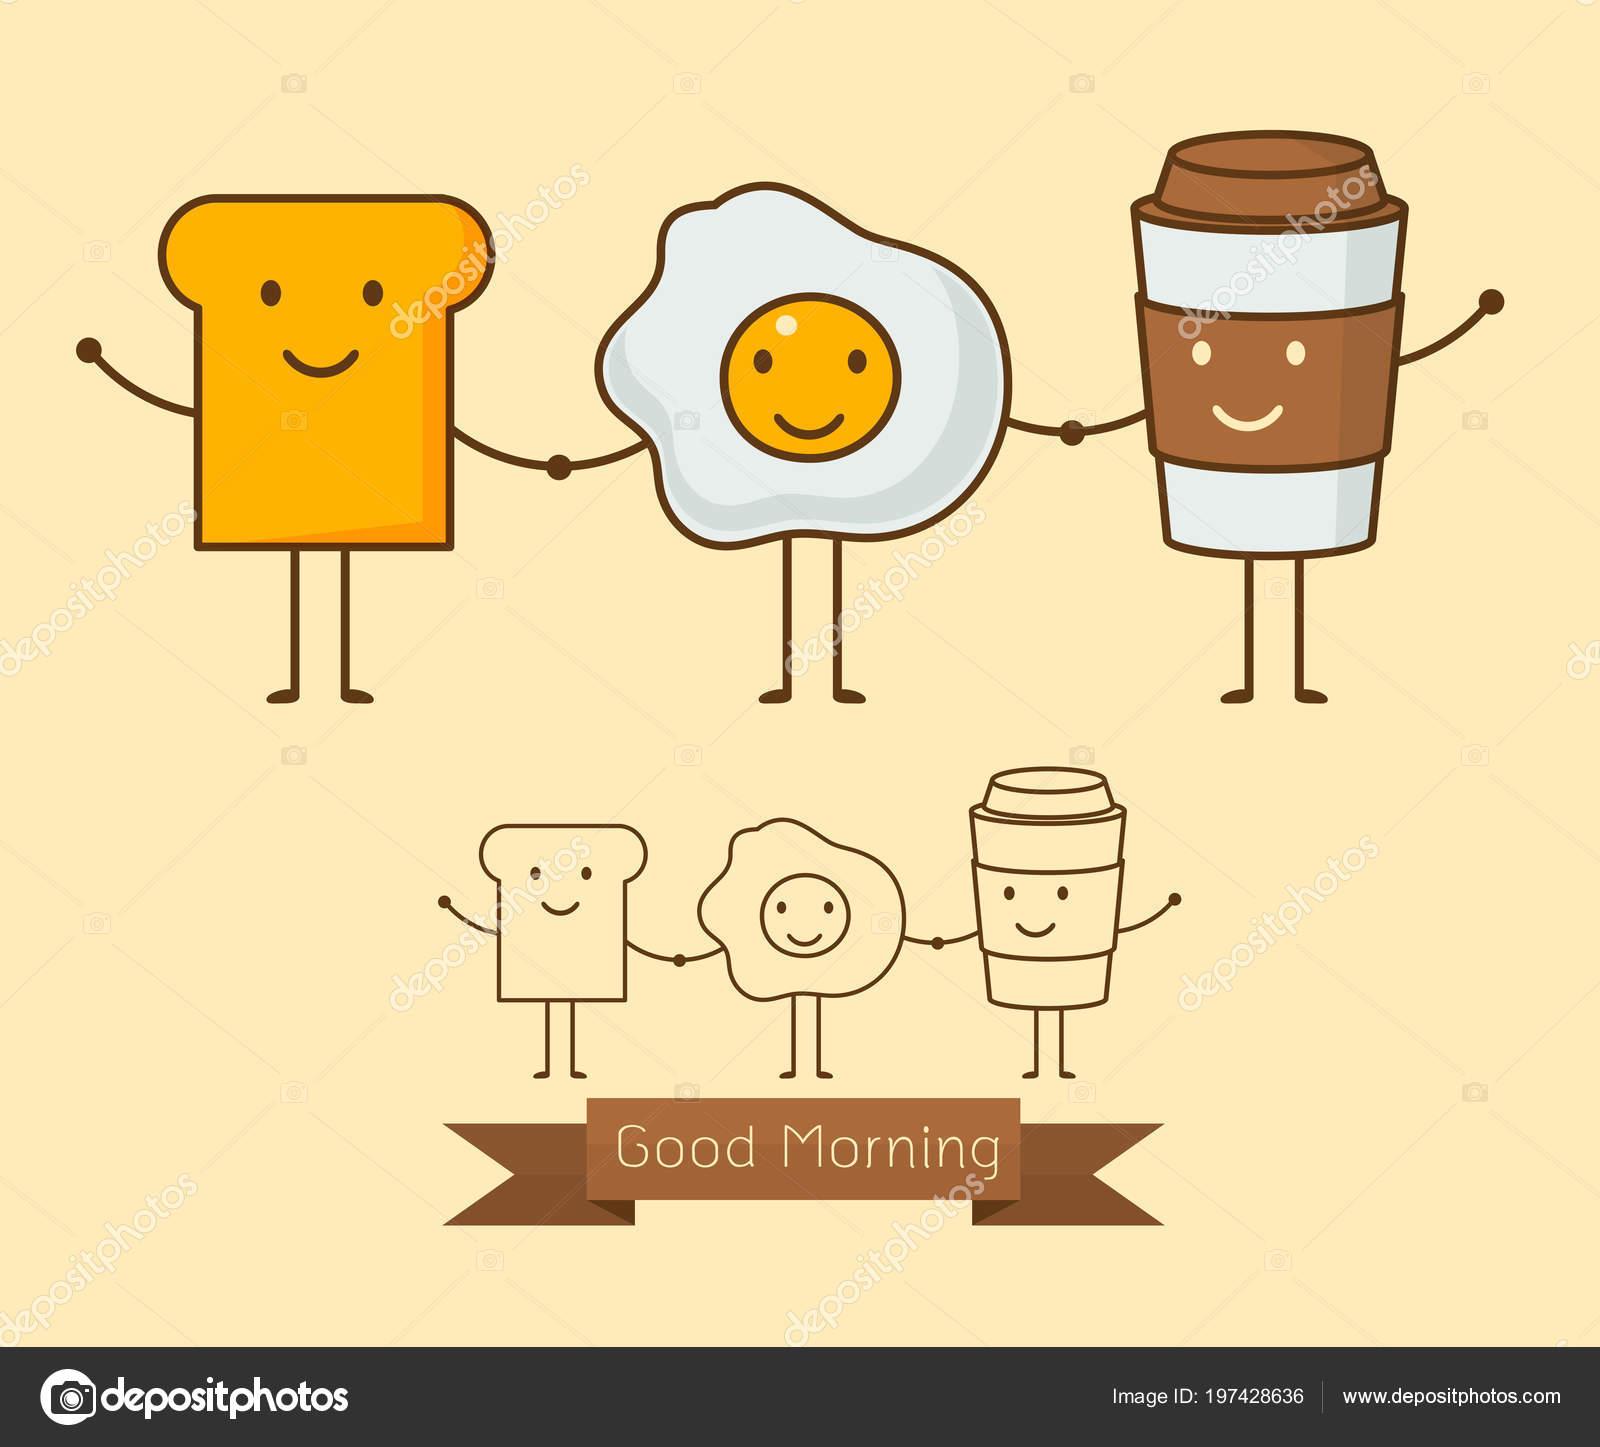 Best Friends Breakfast Good Morning Set Cute Picture Cartoon Icon